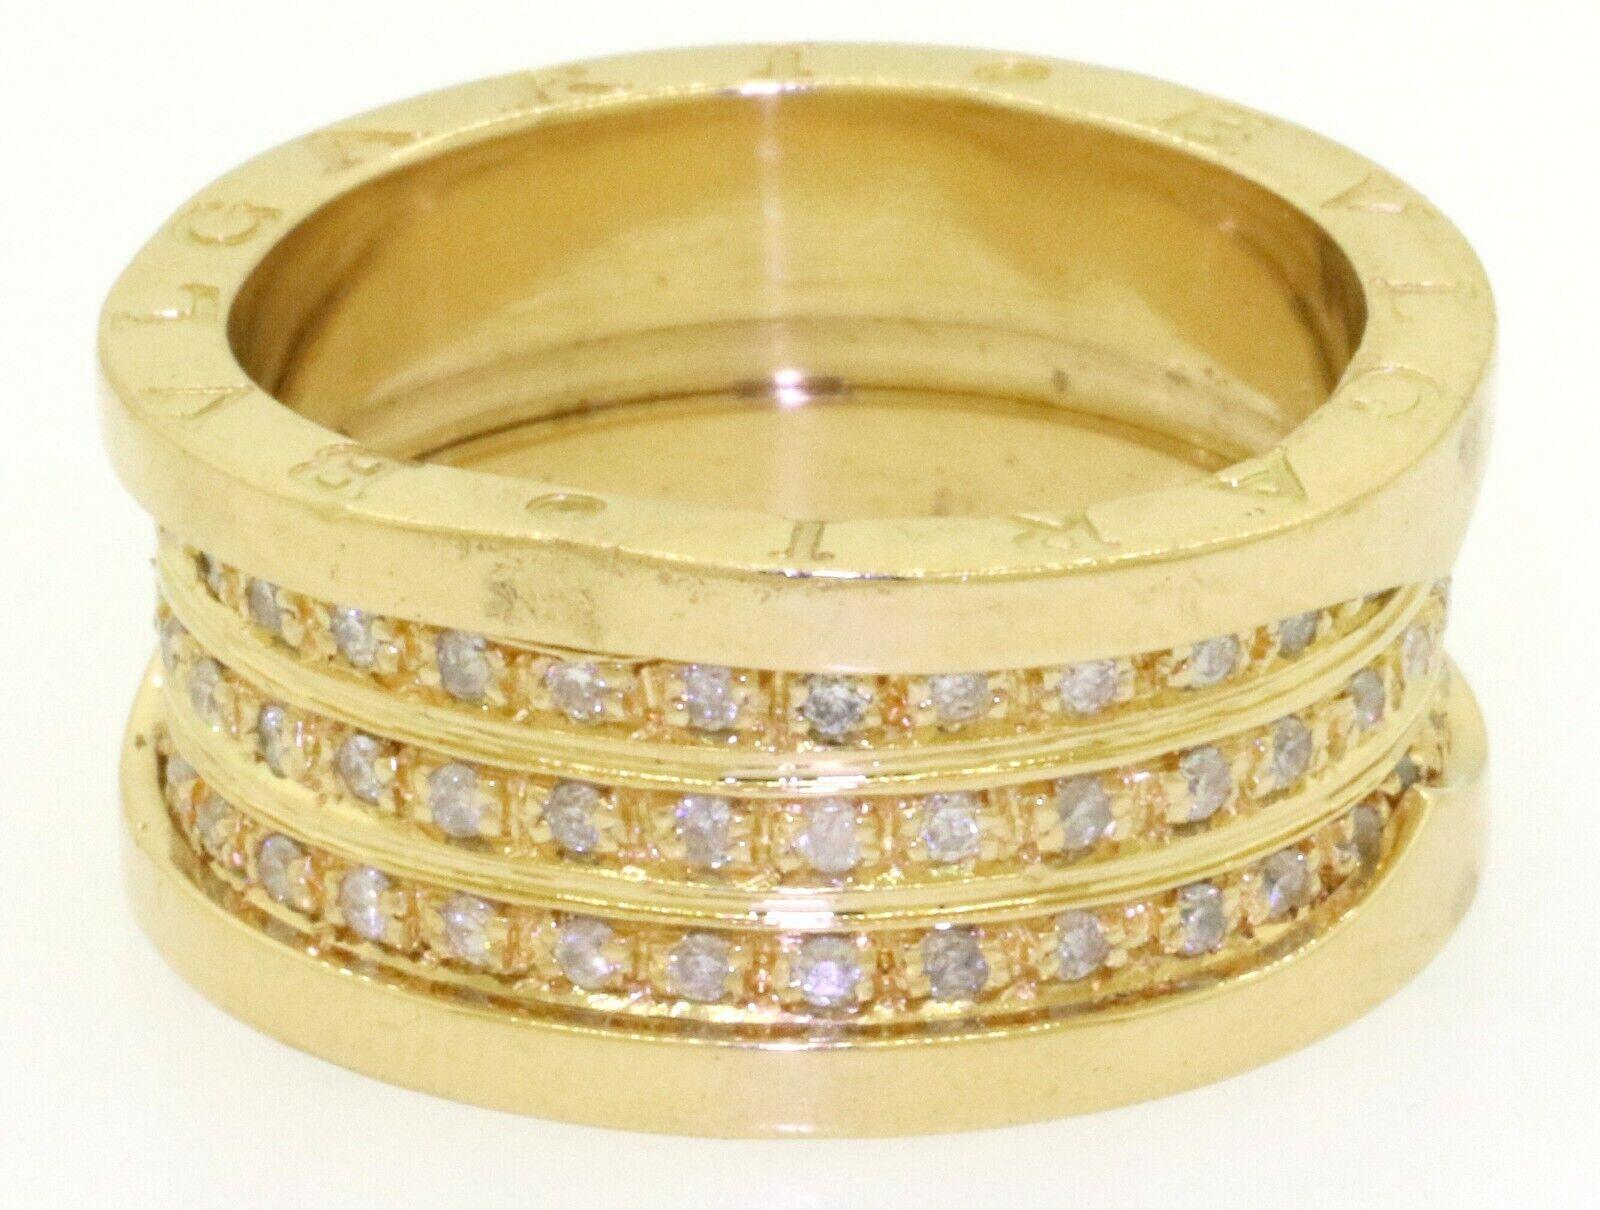 Bvlgari heavy 18K YG 1.0CT diamond 10.3mm wide 3-row eternity band ring size 8